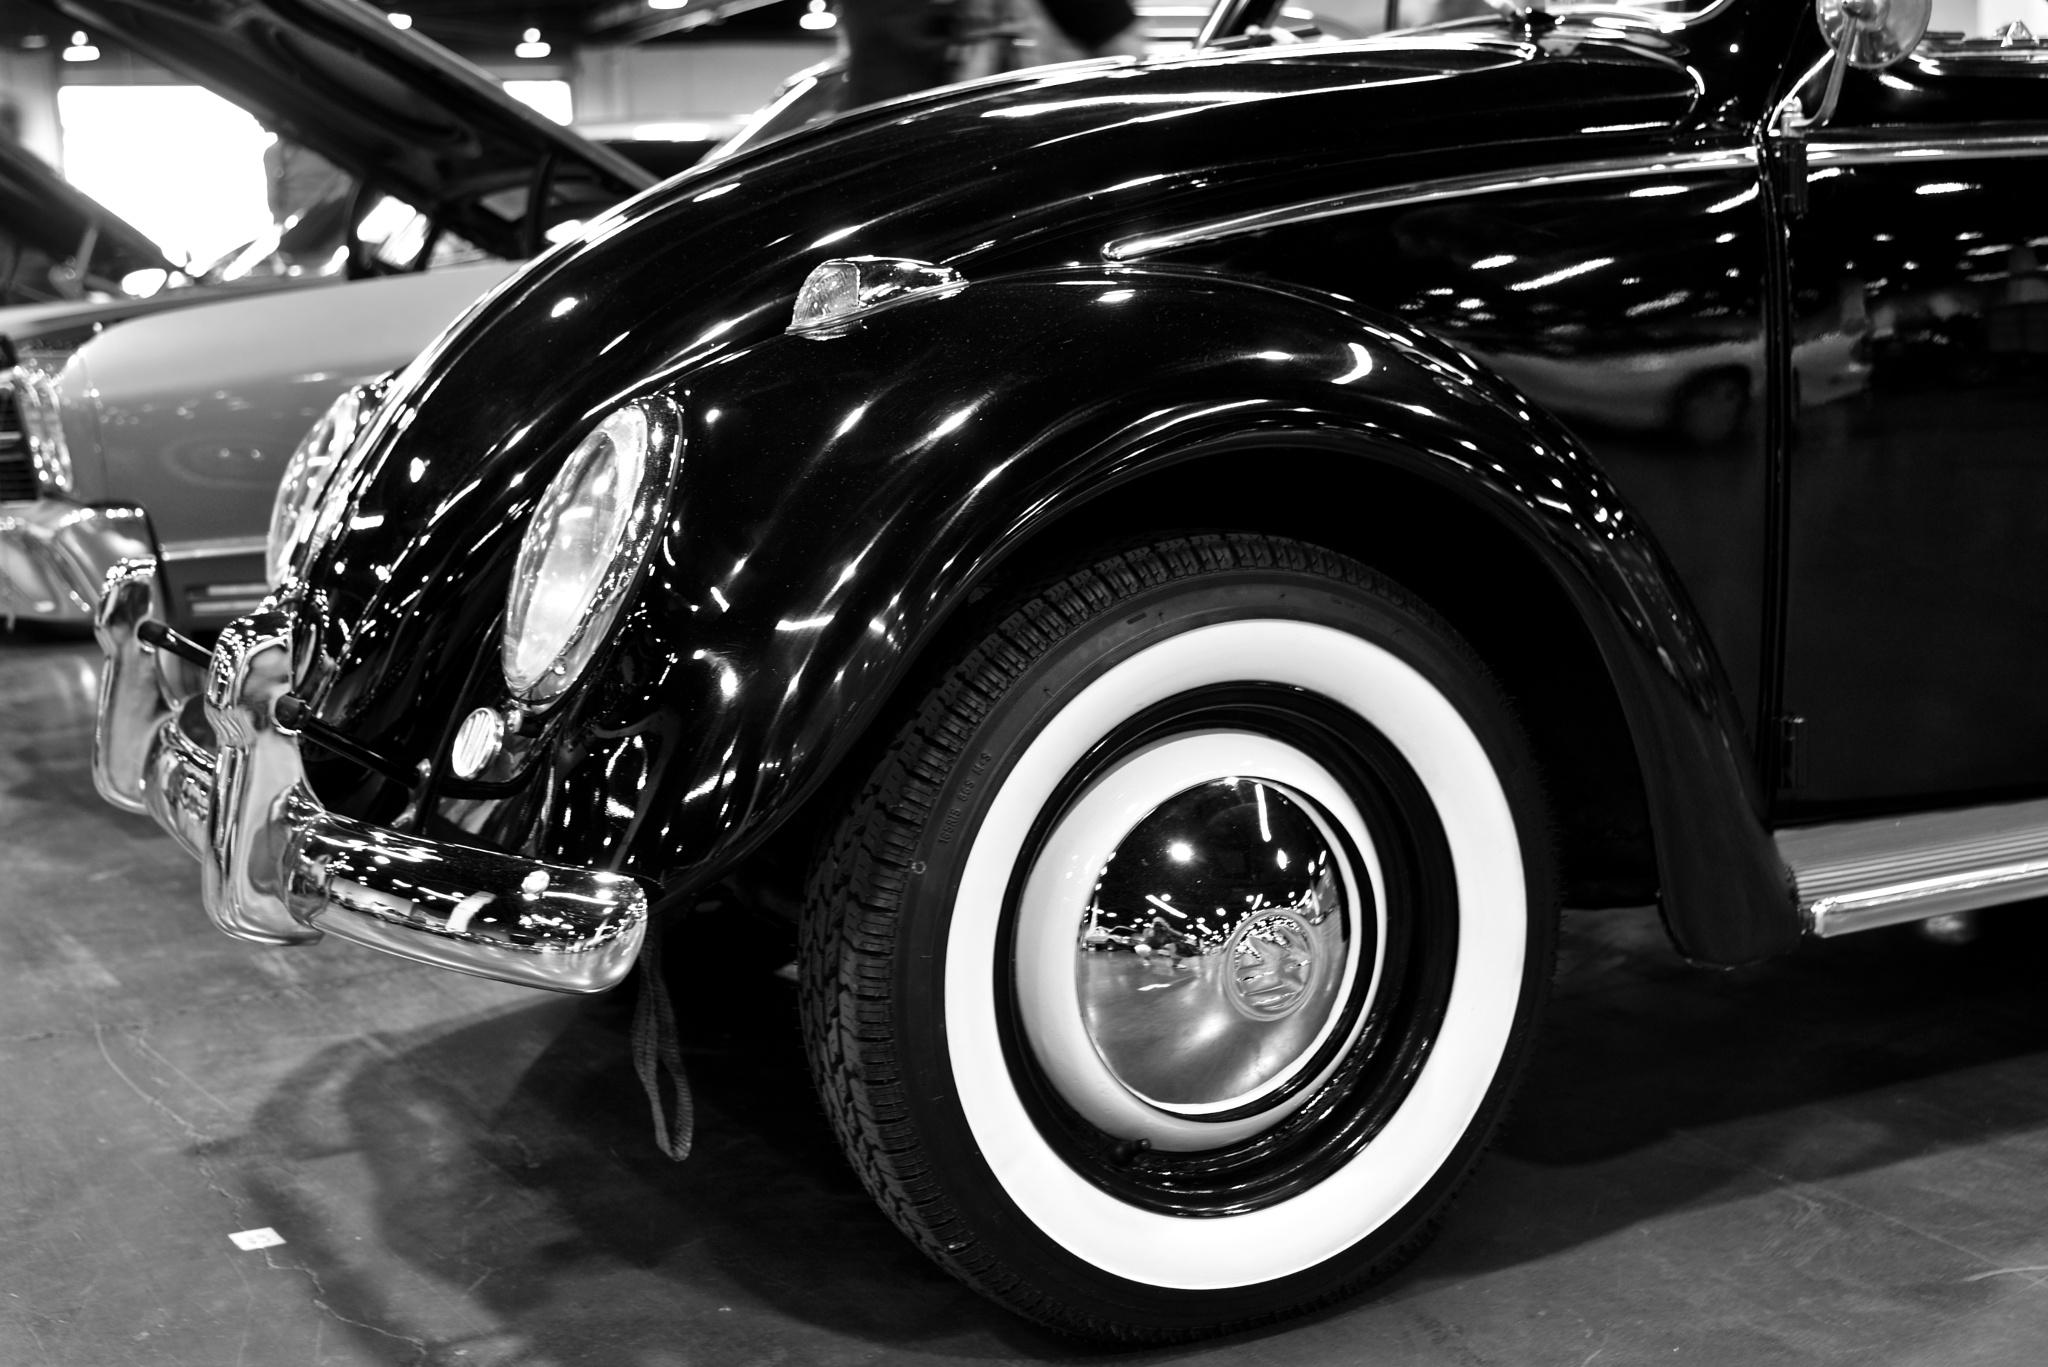 Volkswagon Beetle by belinda.phillips.90